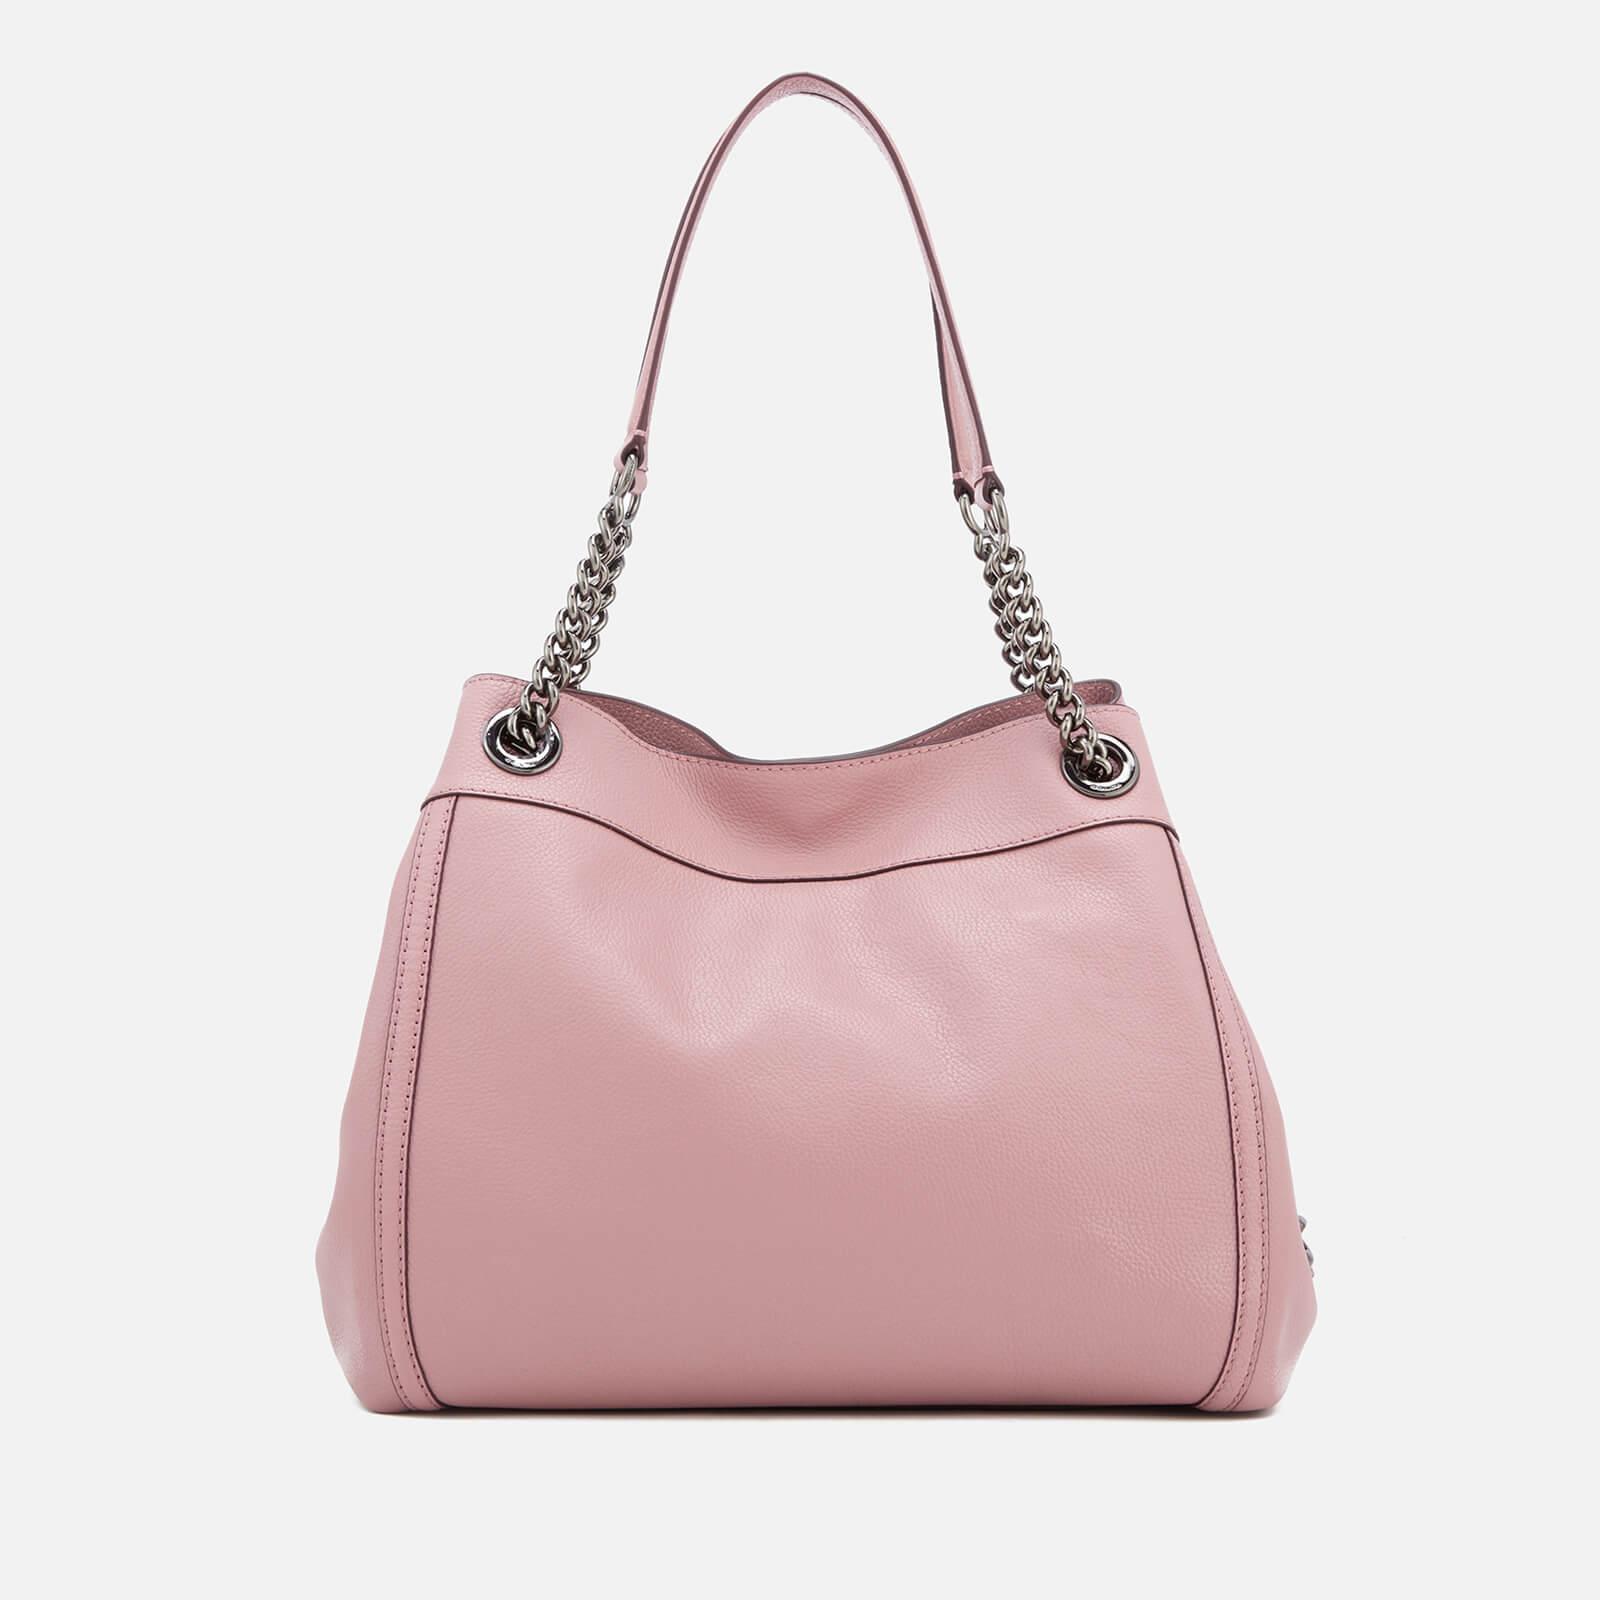 ea453828e5 ... where to buy coach pink turnlock edie shoulder bag lyst. view  fullscreen 38ea4 05342